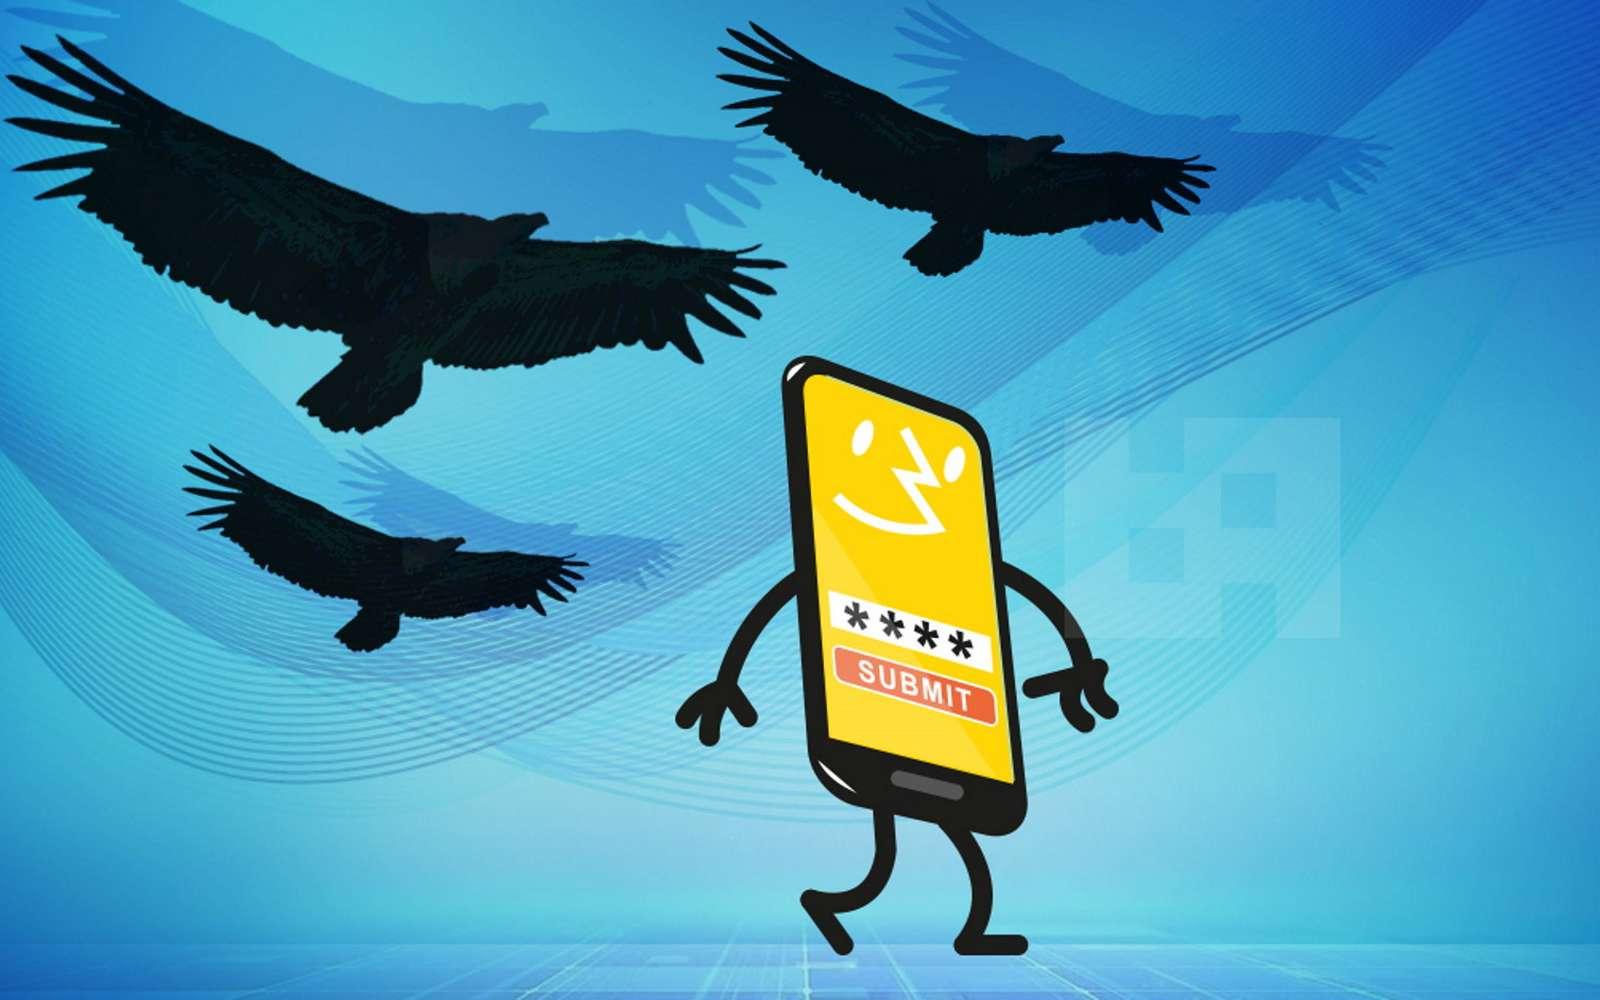 Vultur intègre un serveur VNC afin de diffuser l'écran du smartphone et voler les identifiants bancaires. © ThreatFabric